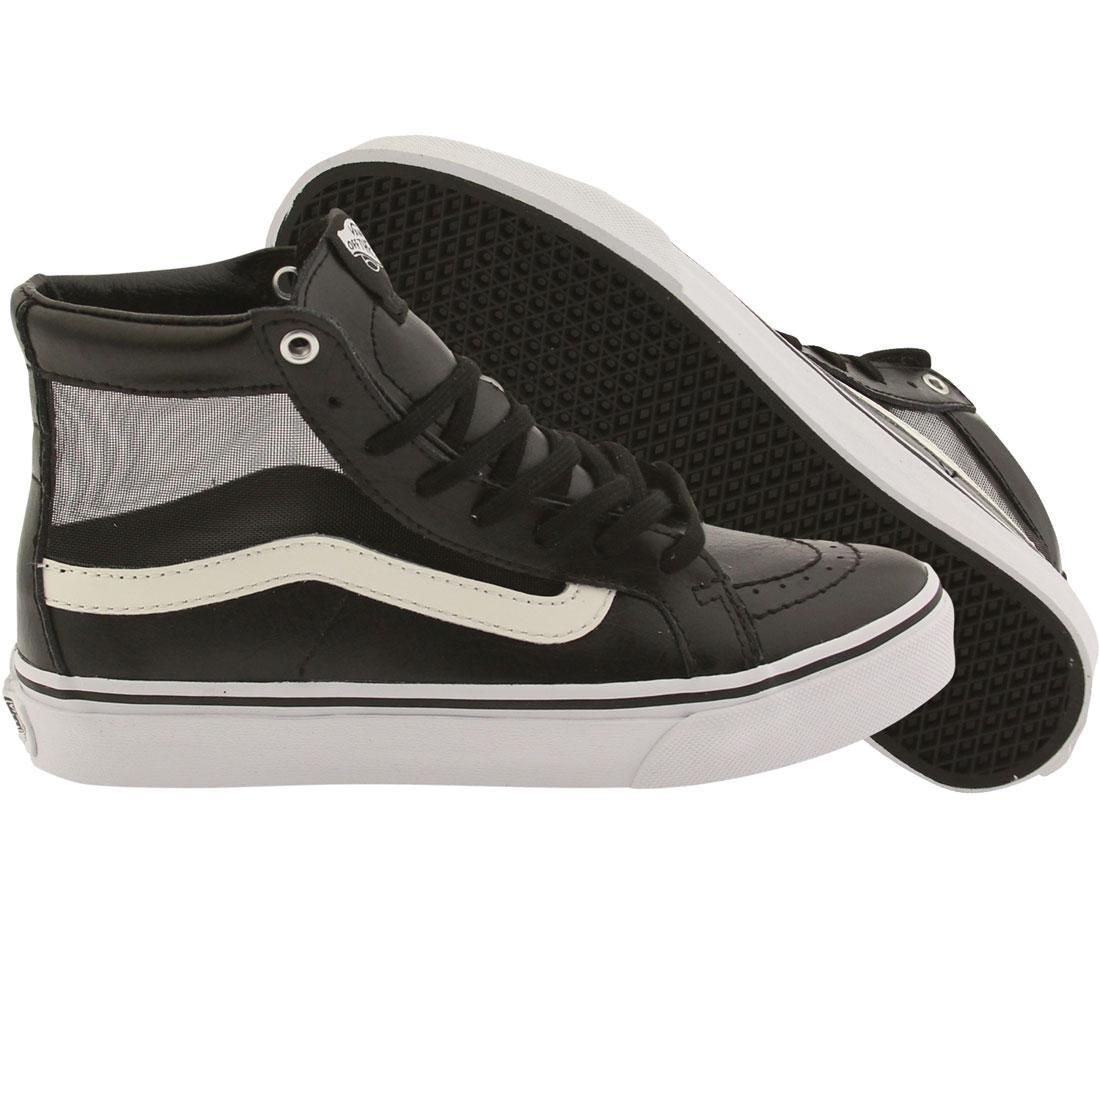 0dadb9e02f5 Vans Women SK8-Hi Slim Cutout - Mesh black white